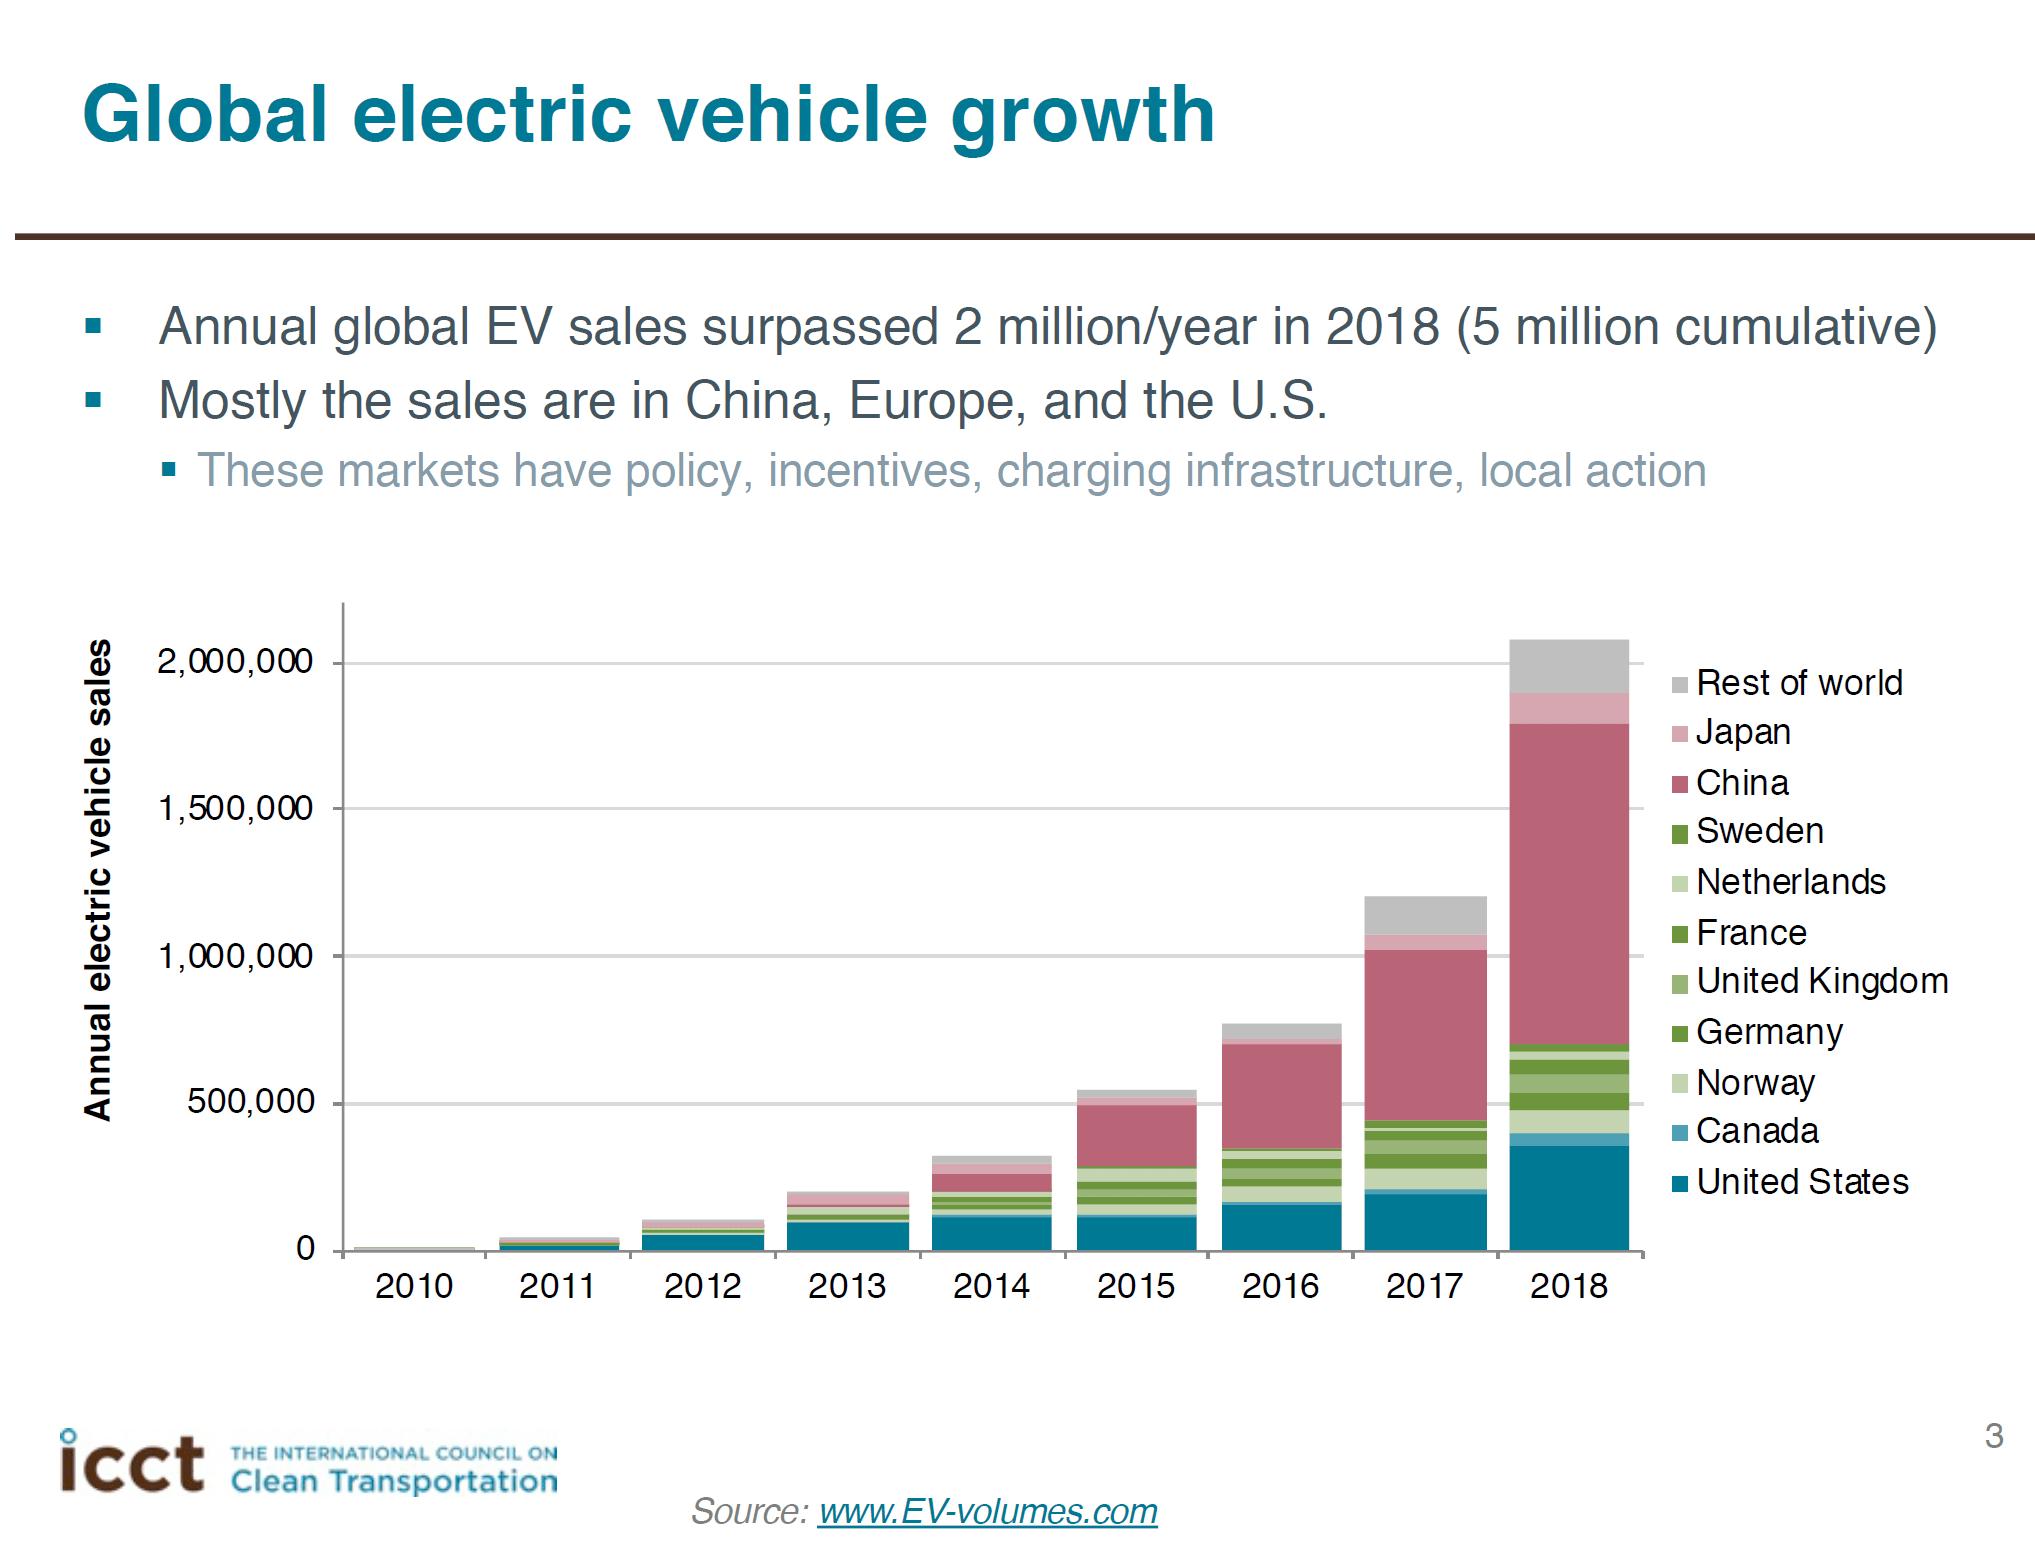 Global Electric Vehicle Growth